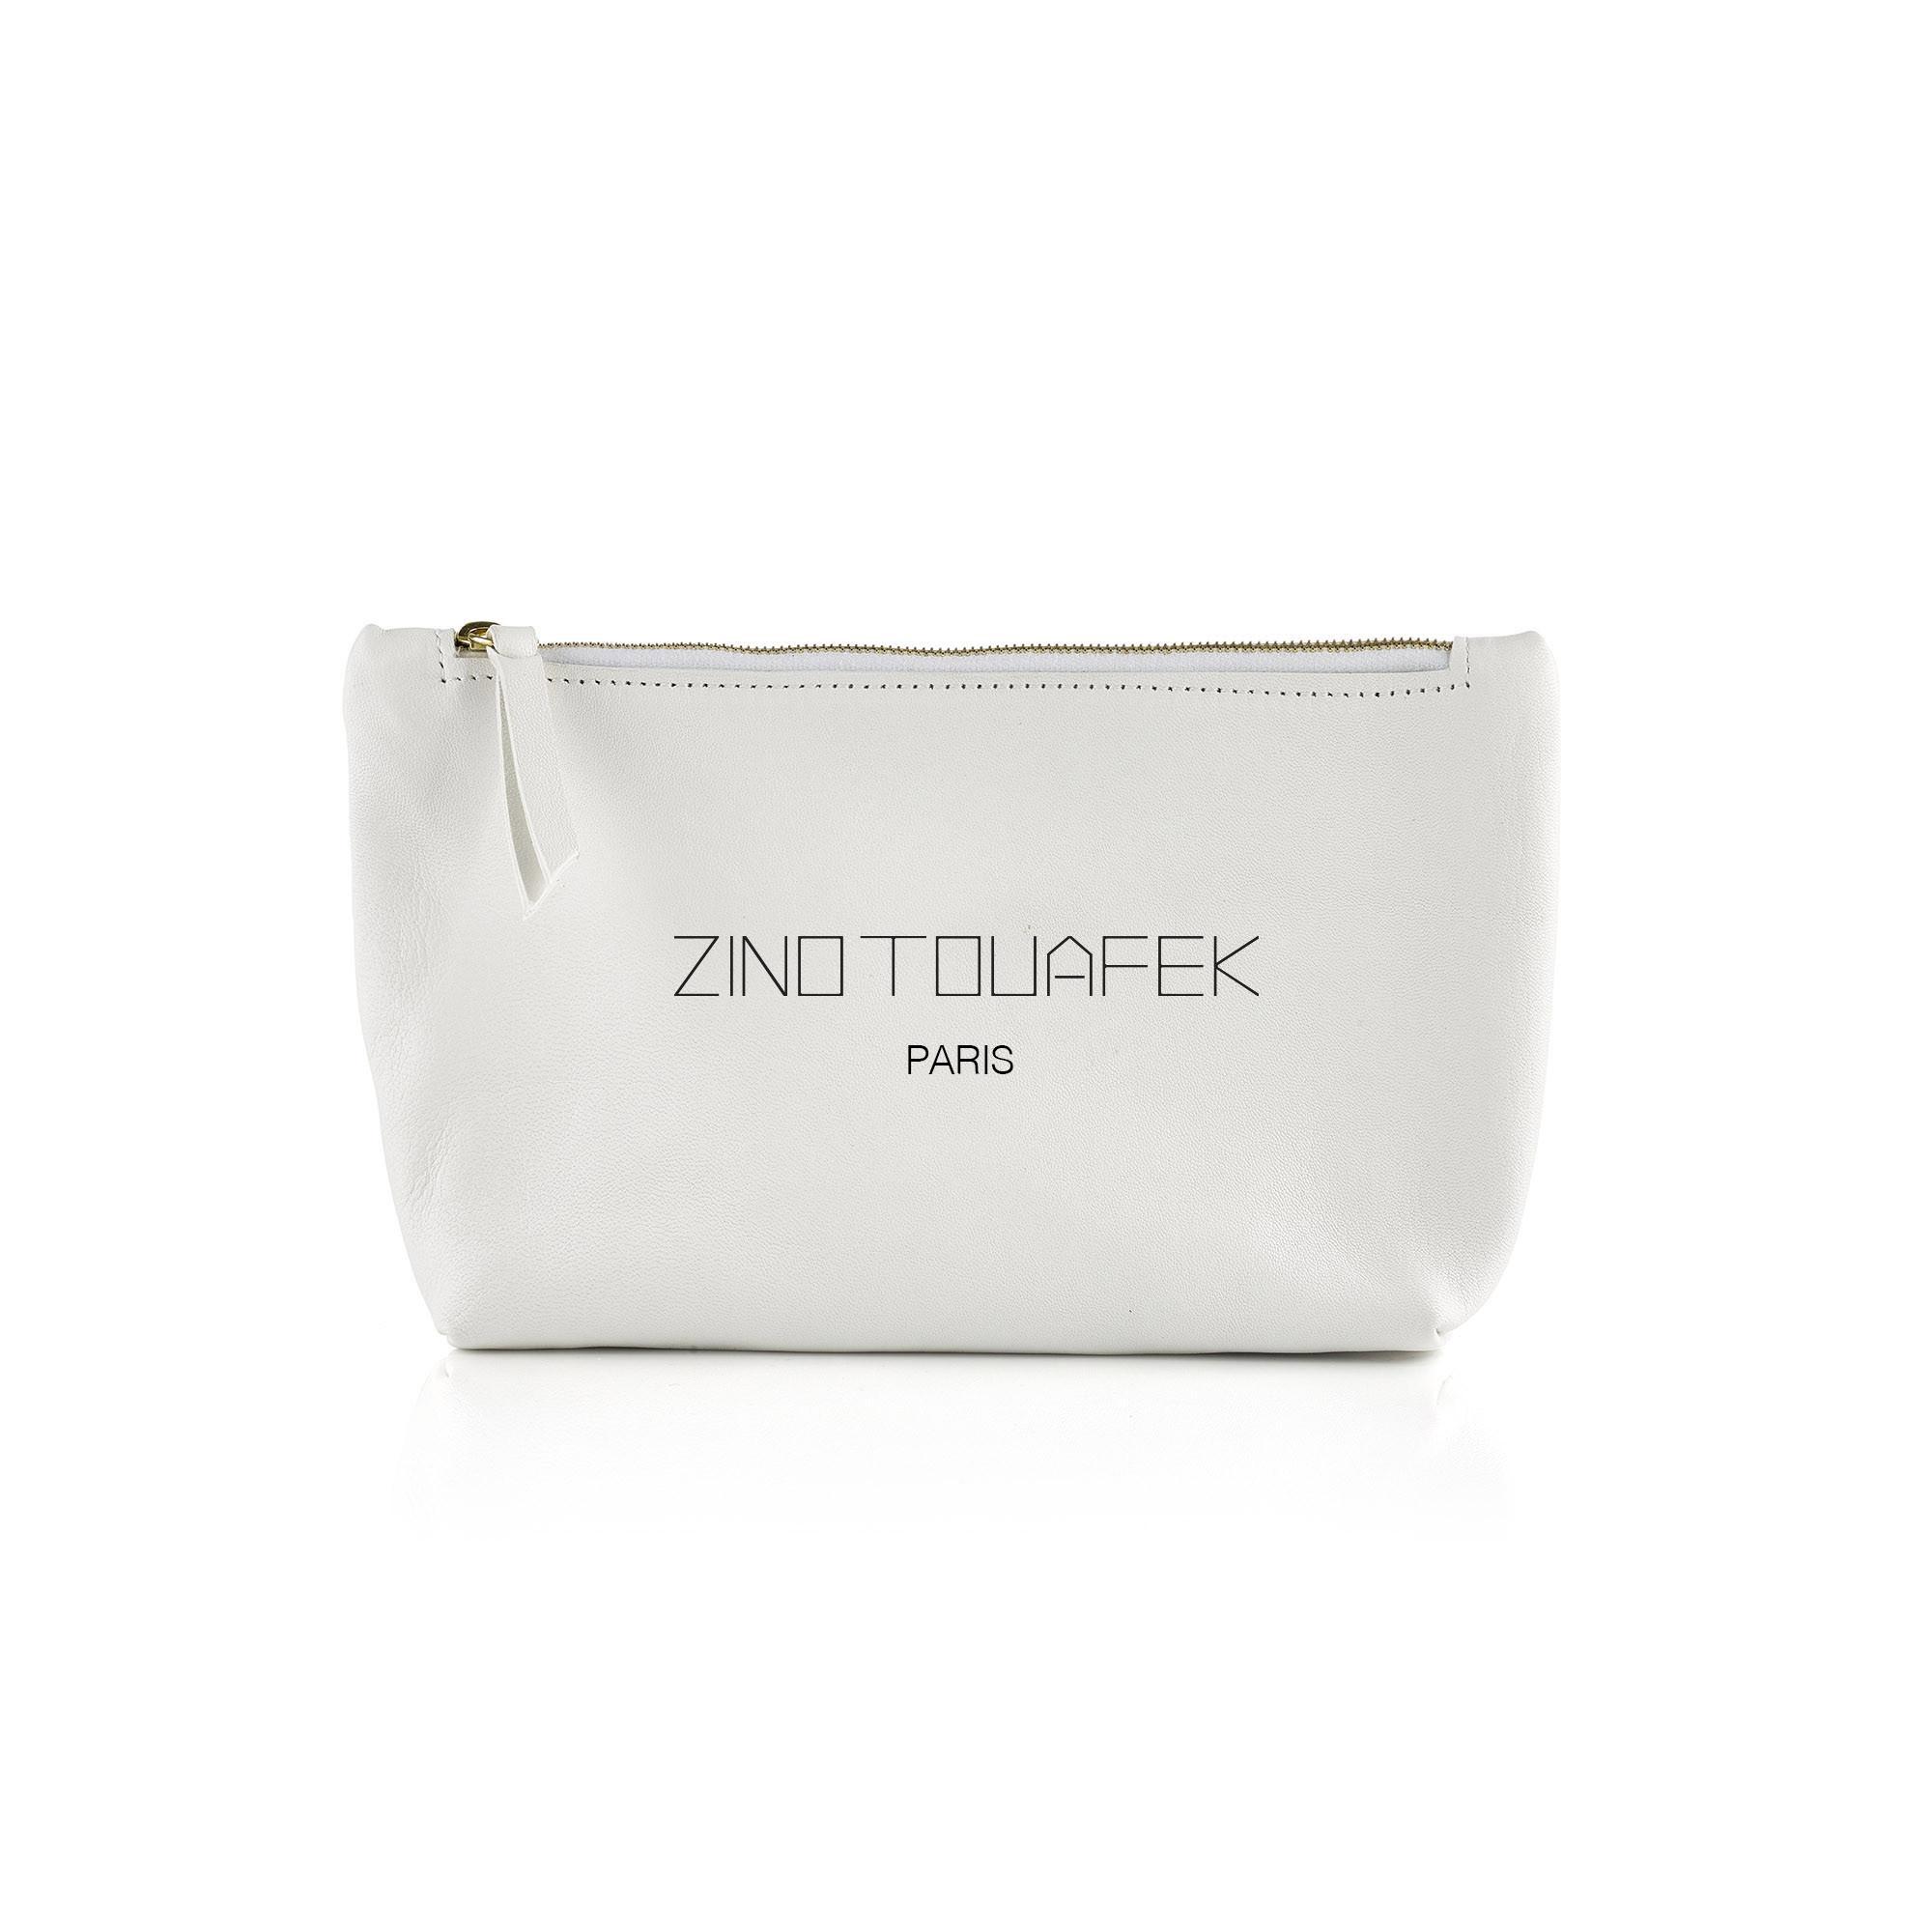 Cosmetics_bag_white_2048x2048_copie-1465565499.jpg